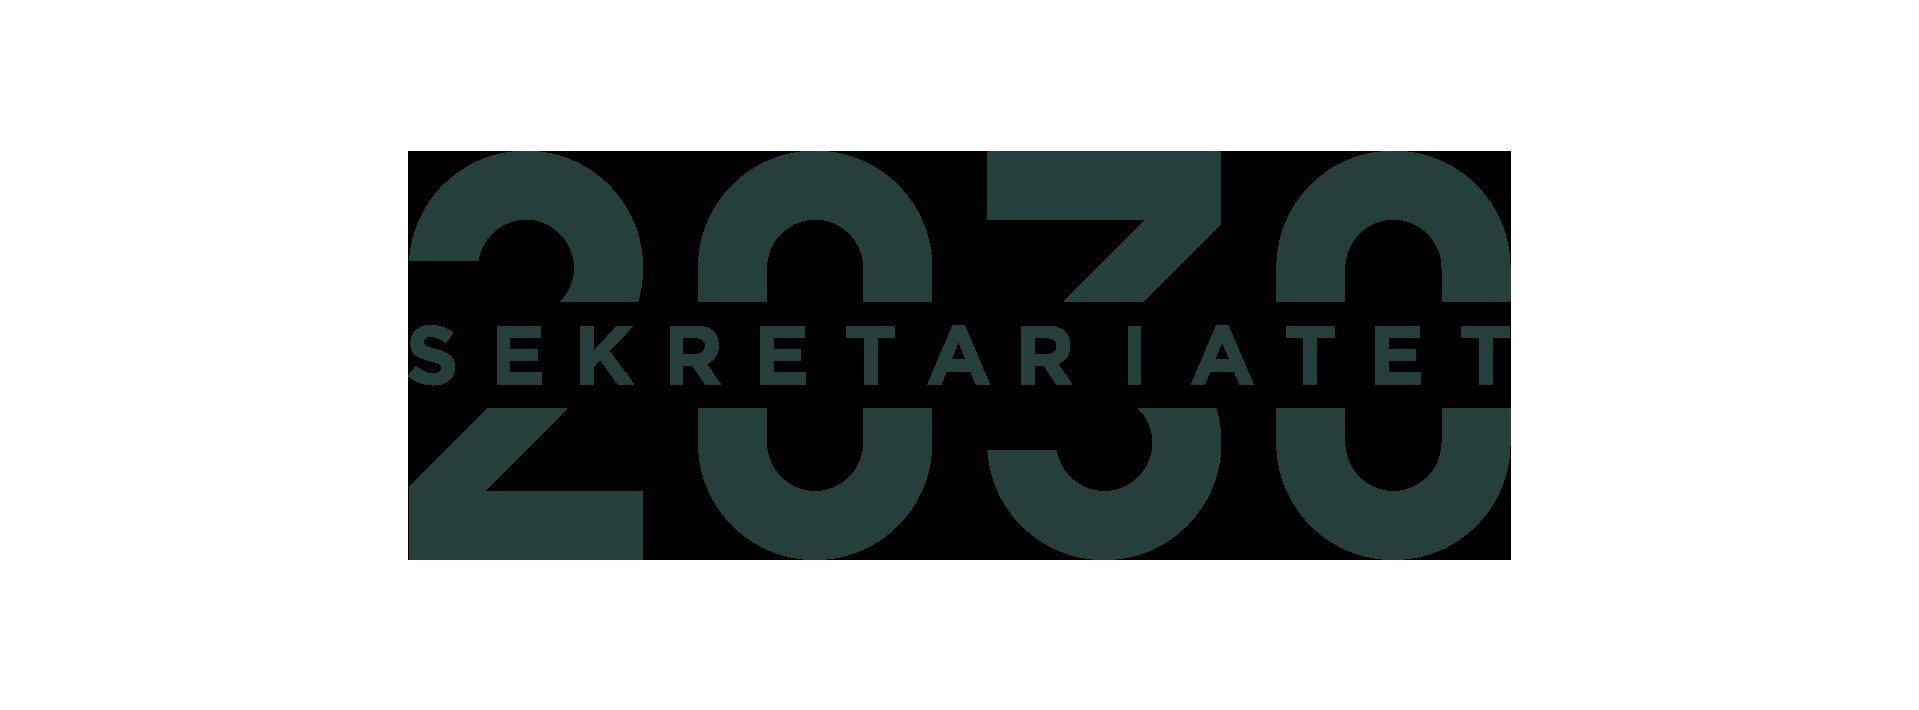 2030-sekretariatet